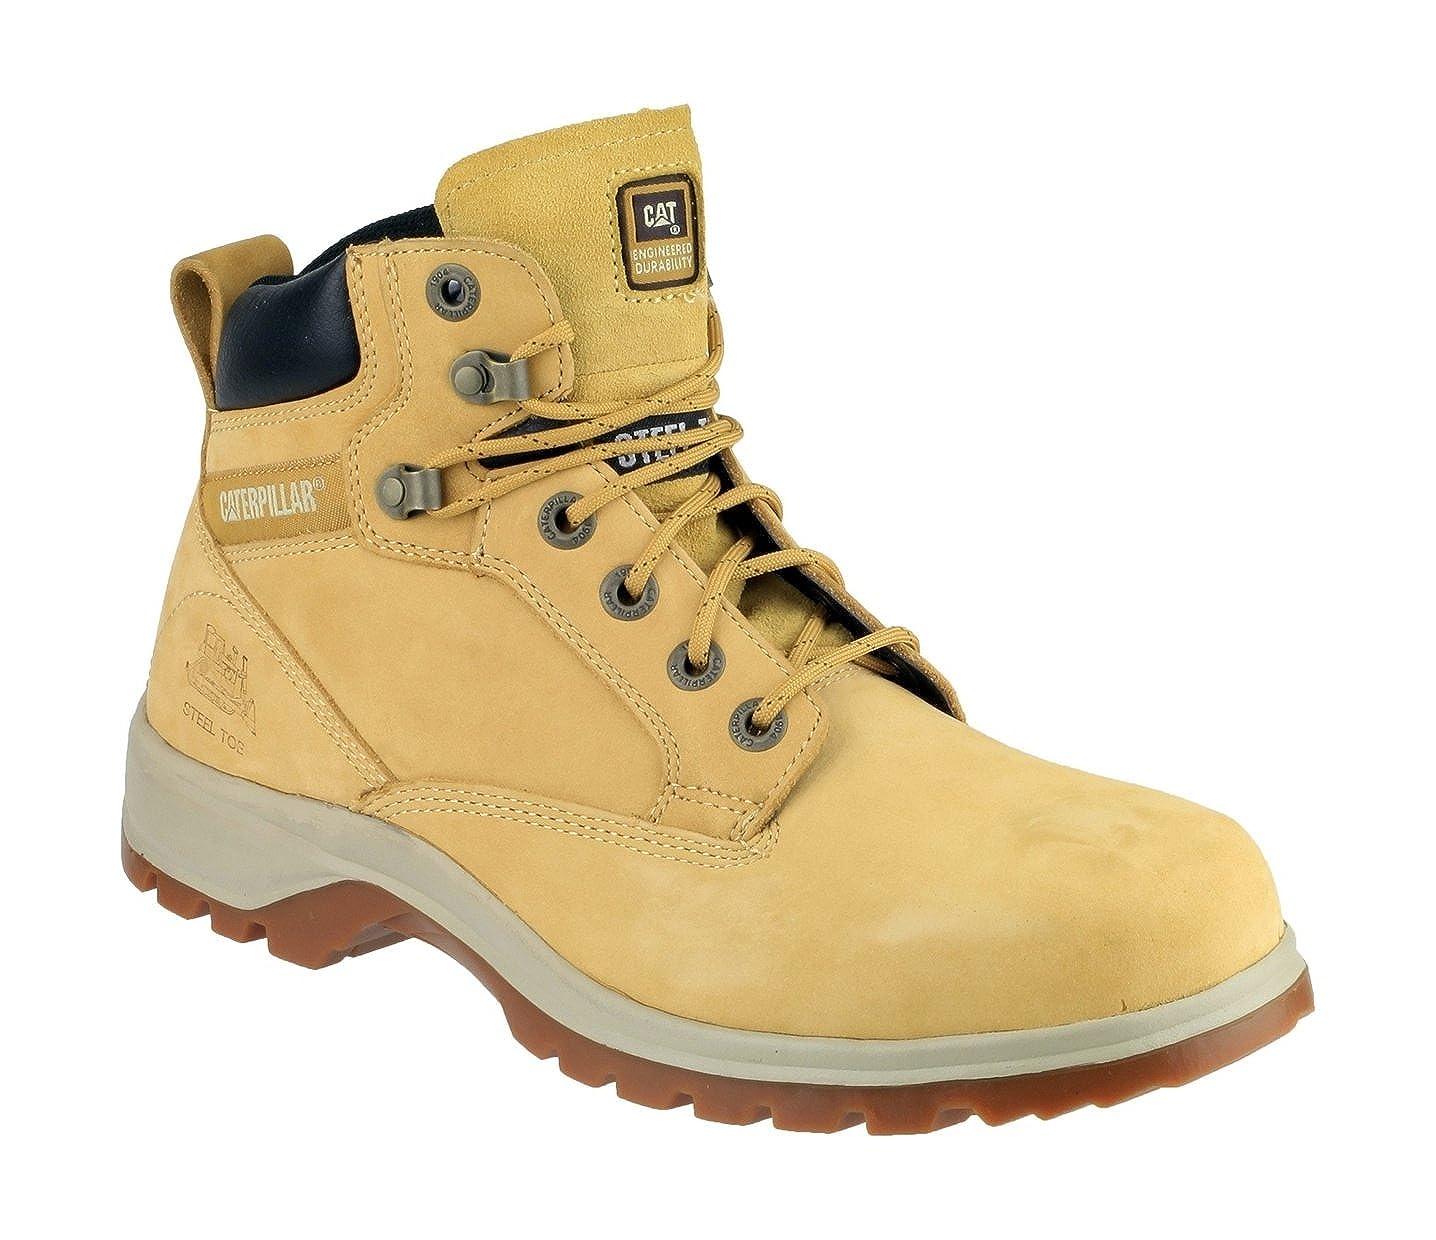 Ladies Womens Cat Kitson Honey Safety Toe Cap Work Boots Sizes 3 4 5 6 7 8   Amazon.co.uk  Shoes   Bags 2457756e373b